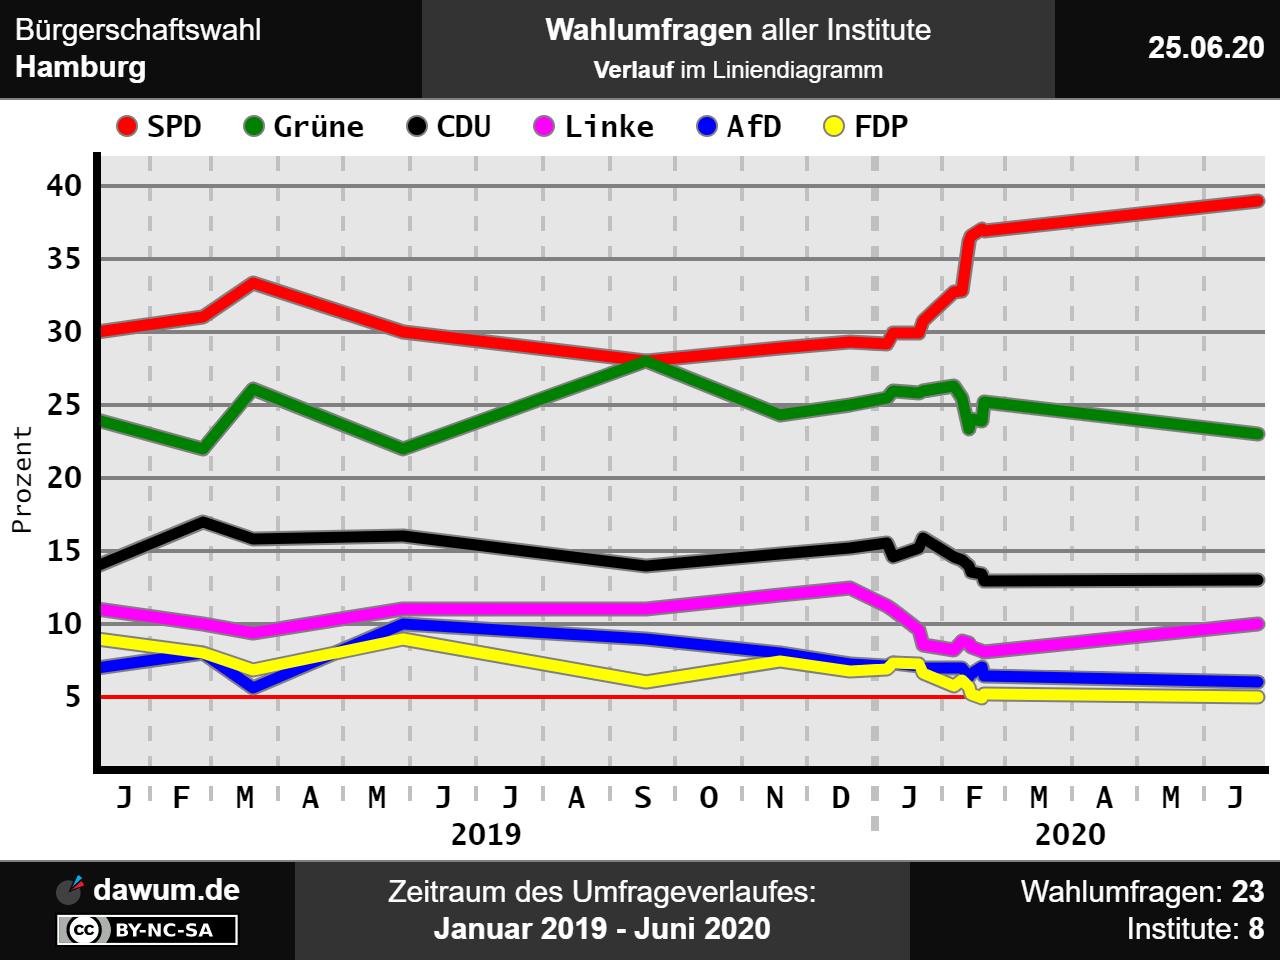 Wahlumfrage Hamburg